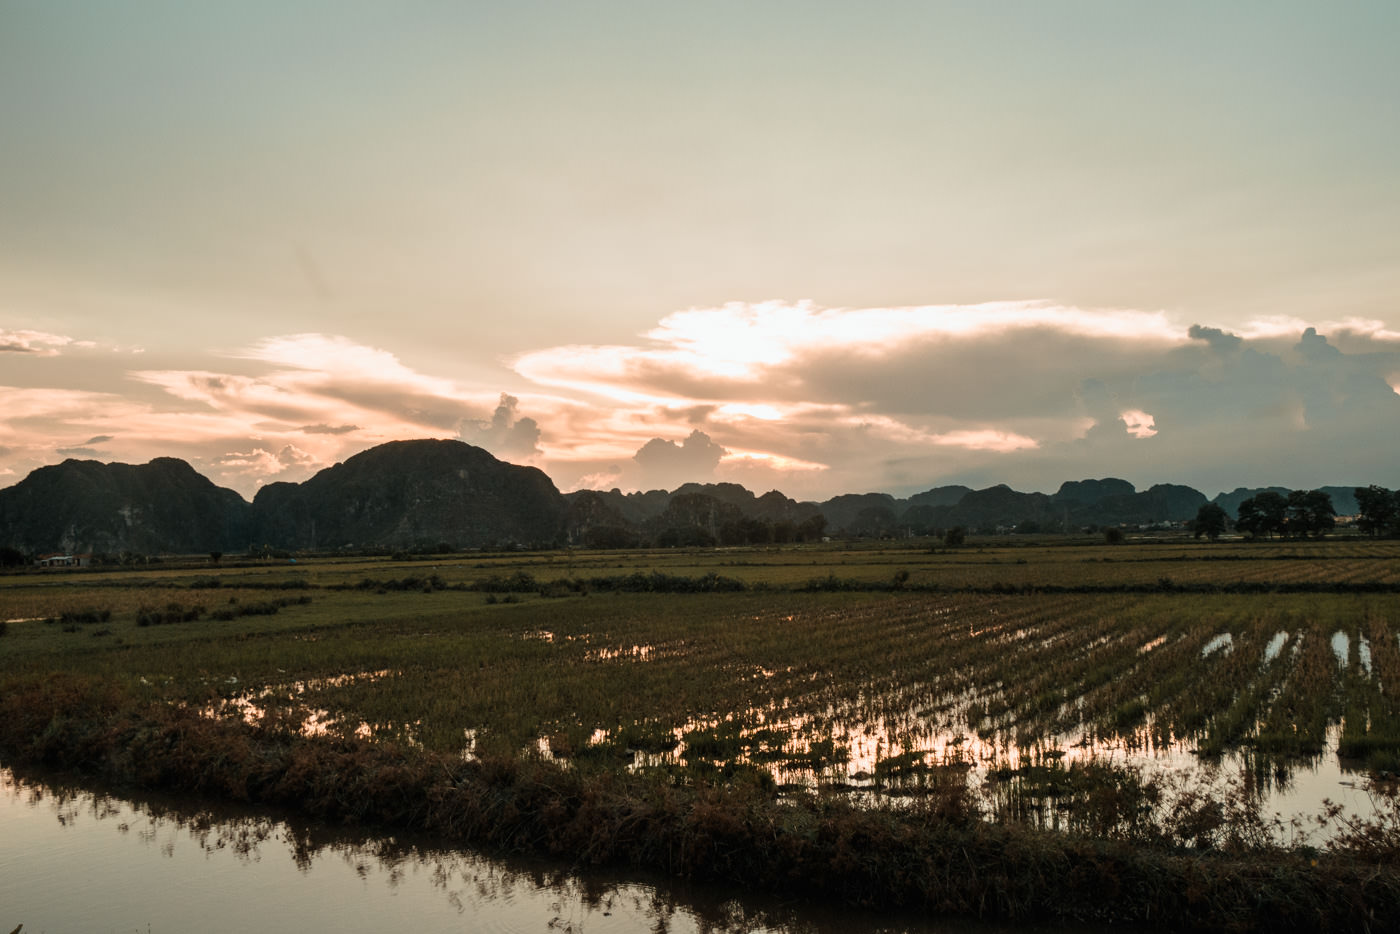 Reisfelder in der Ninh Binh Region in Vietnam